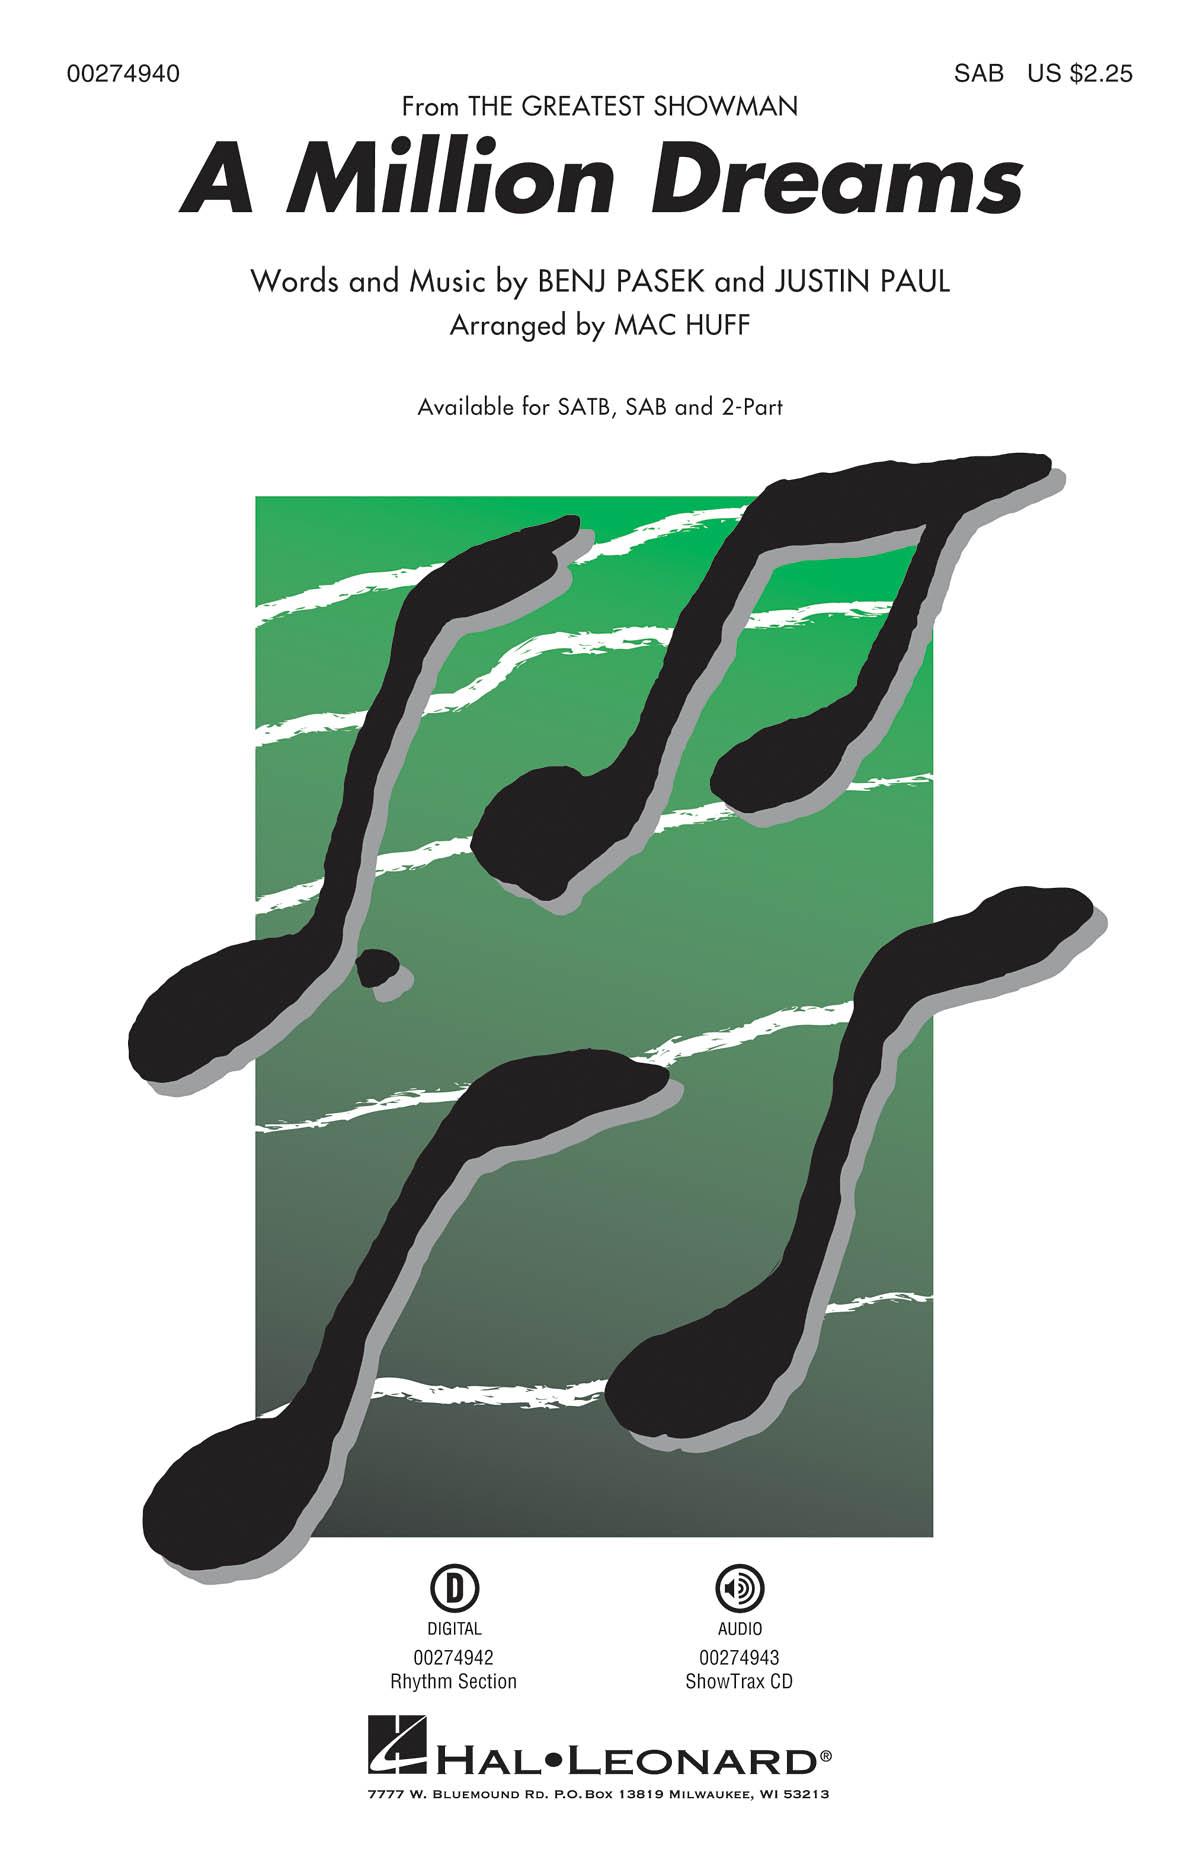 A Million Dreams 'The Greatest Showman' - SAB (arr. Huff). Sheet Music  Downloads for SAB  Piano Accompaniment